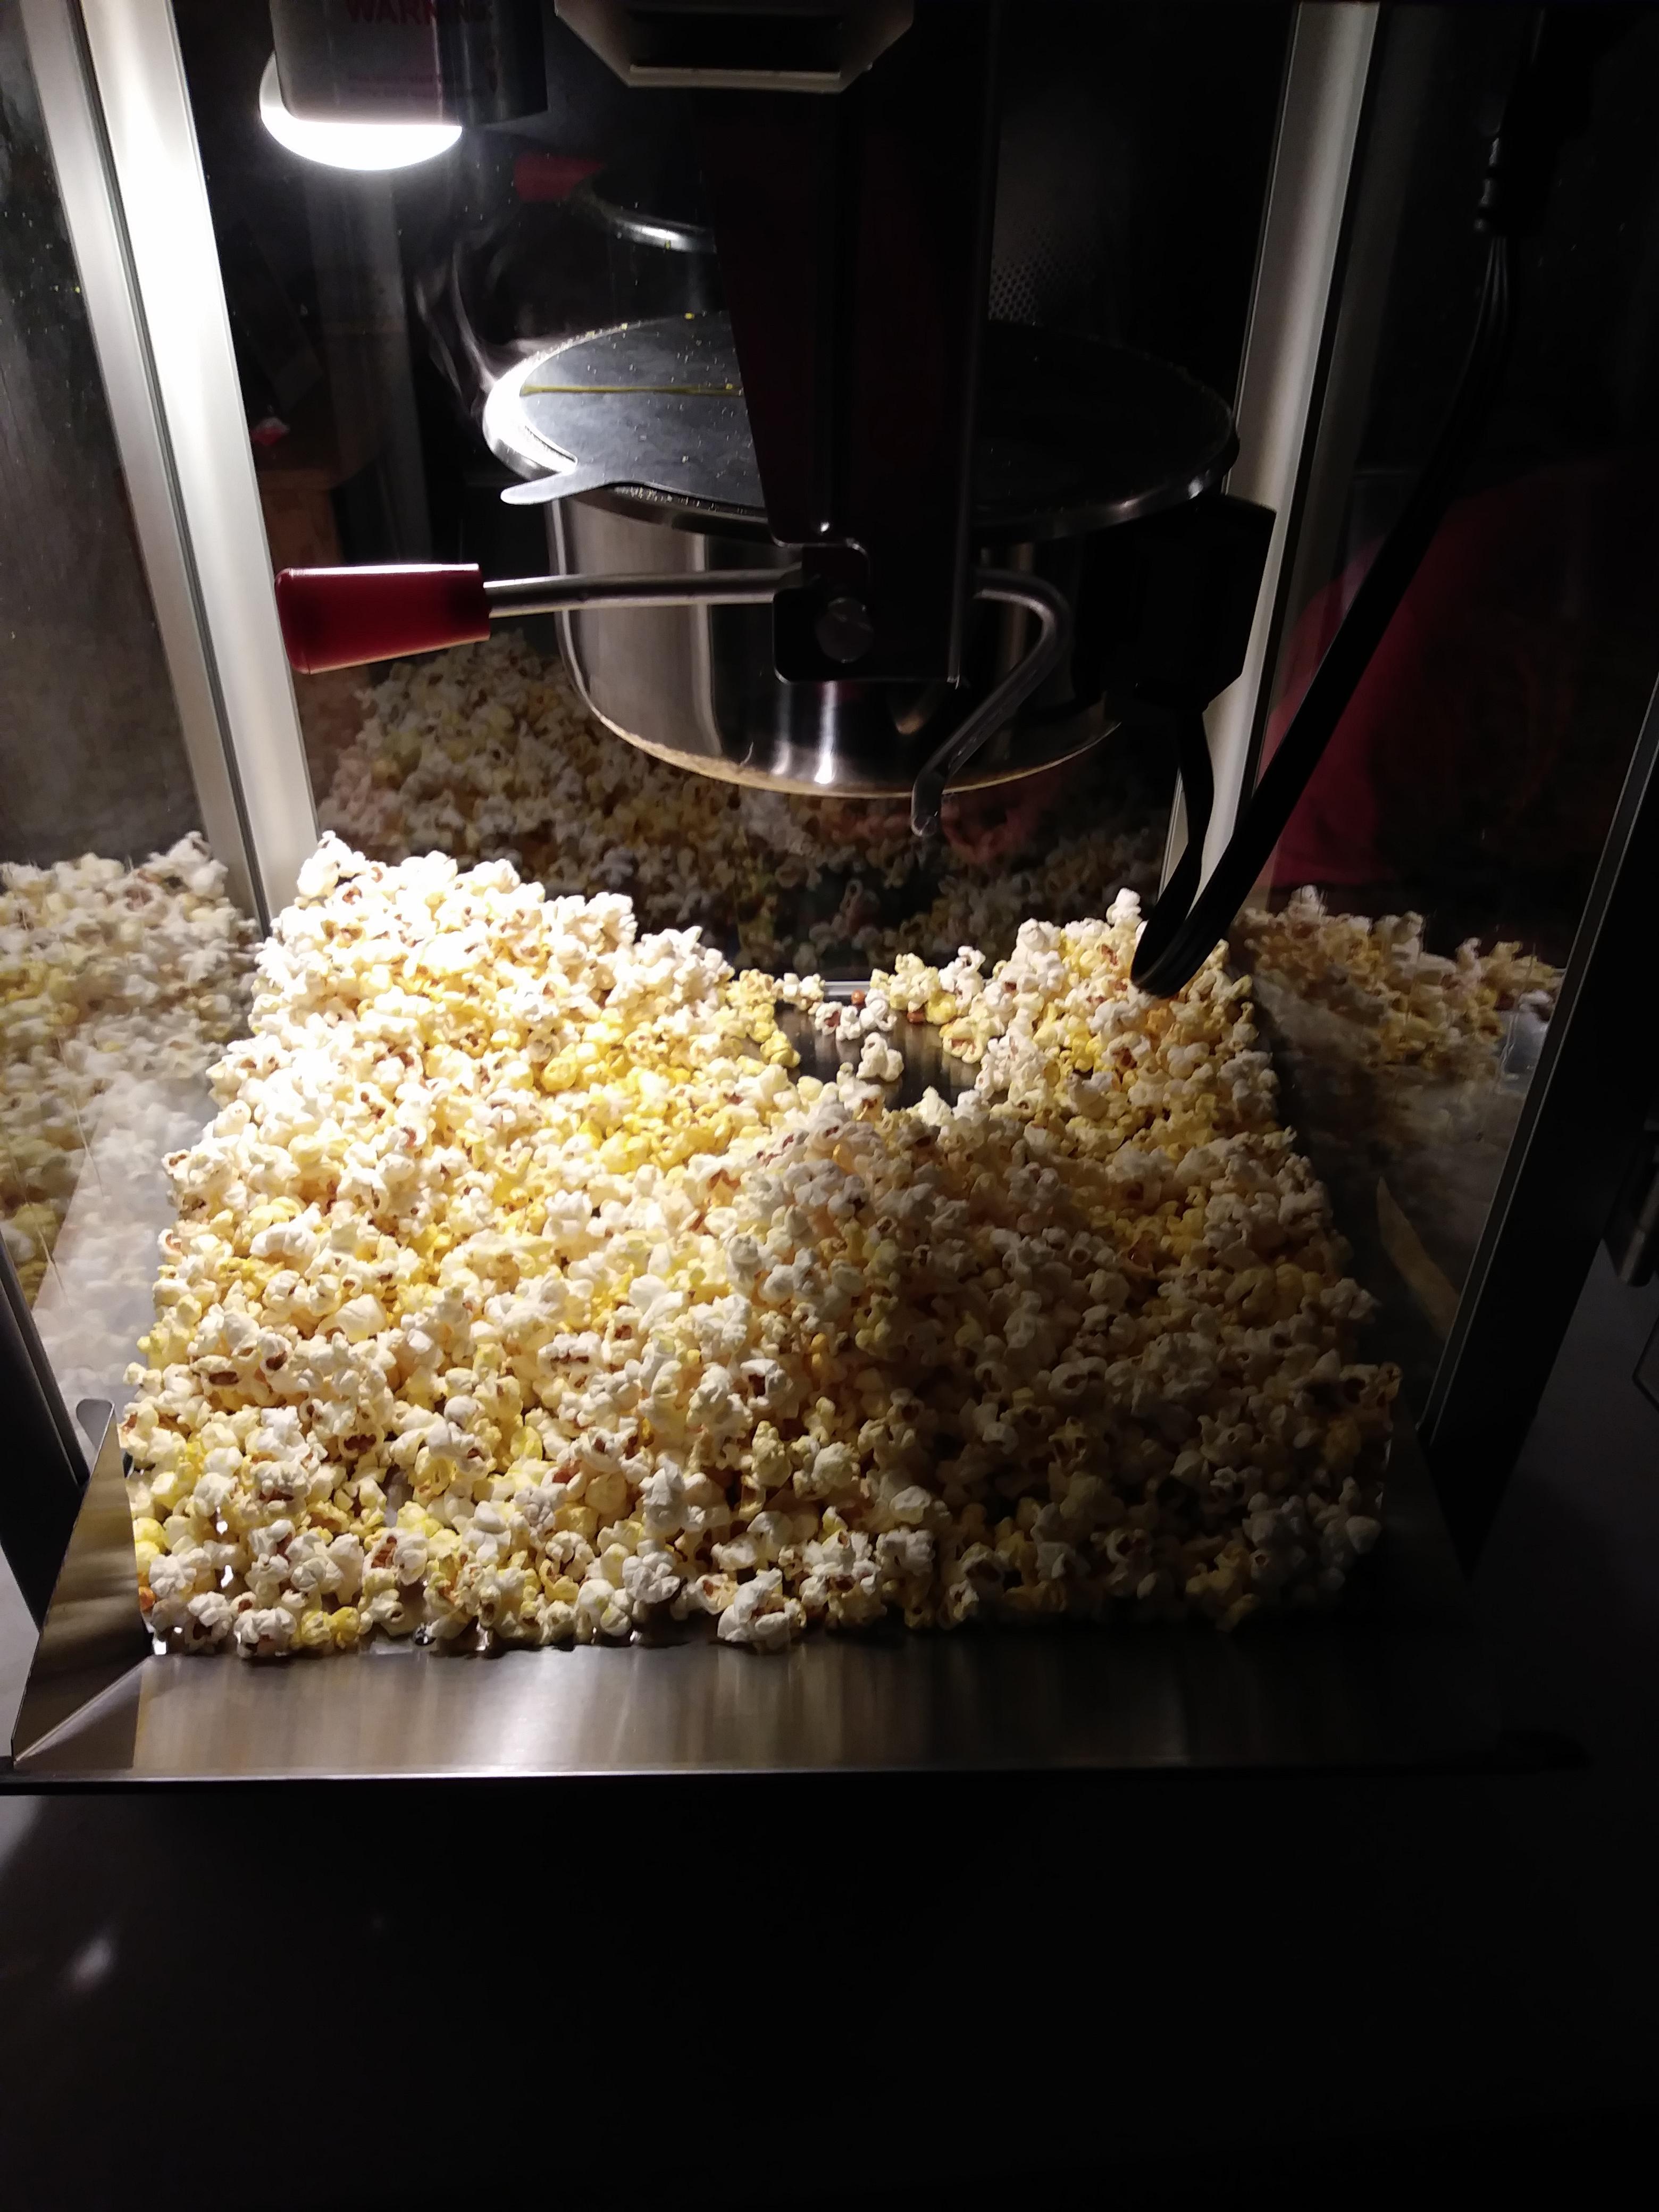 Popcorn Popper Carnival King Pm850 8 Oz Machine Switch Wiring Diagram For 3